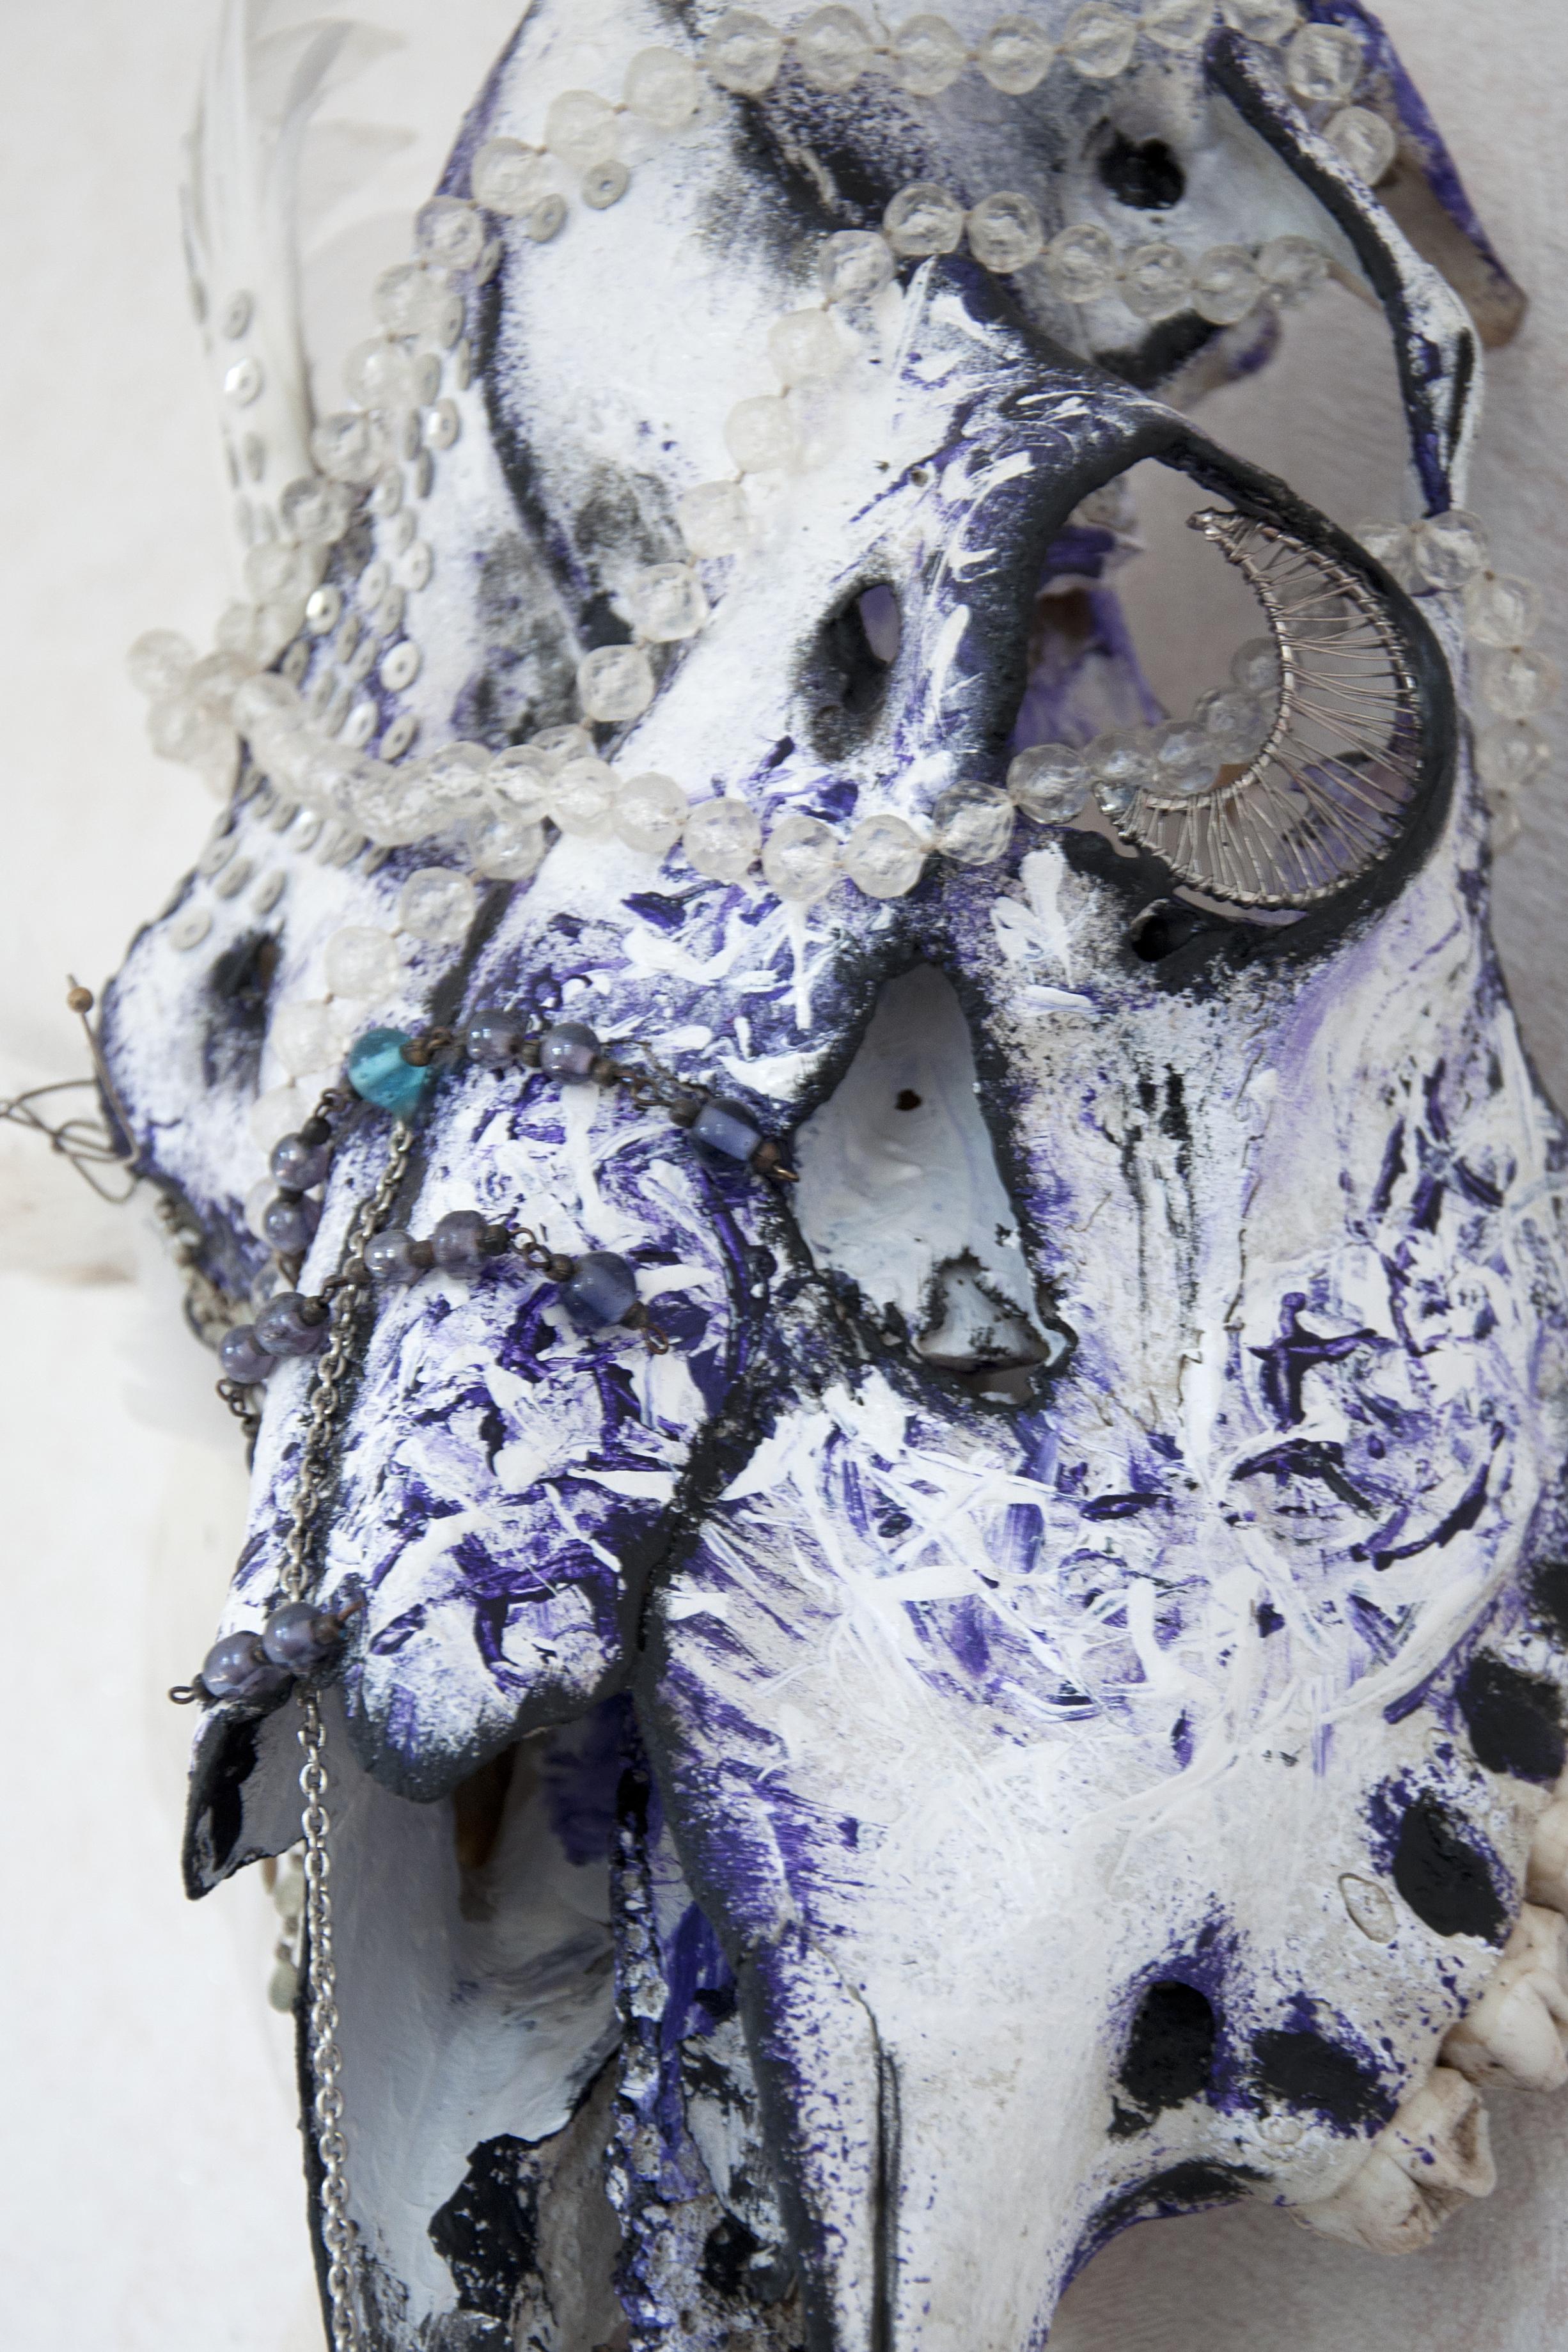 petra-shara-stoor-skull-art-dheluleaa-3.png